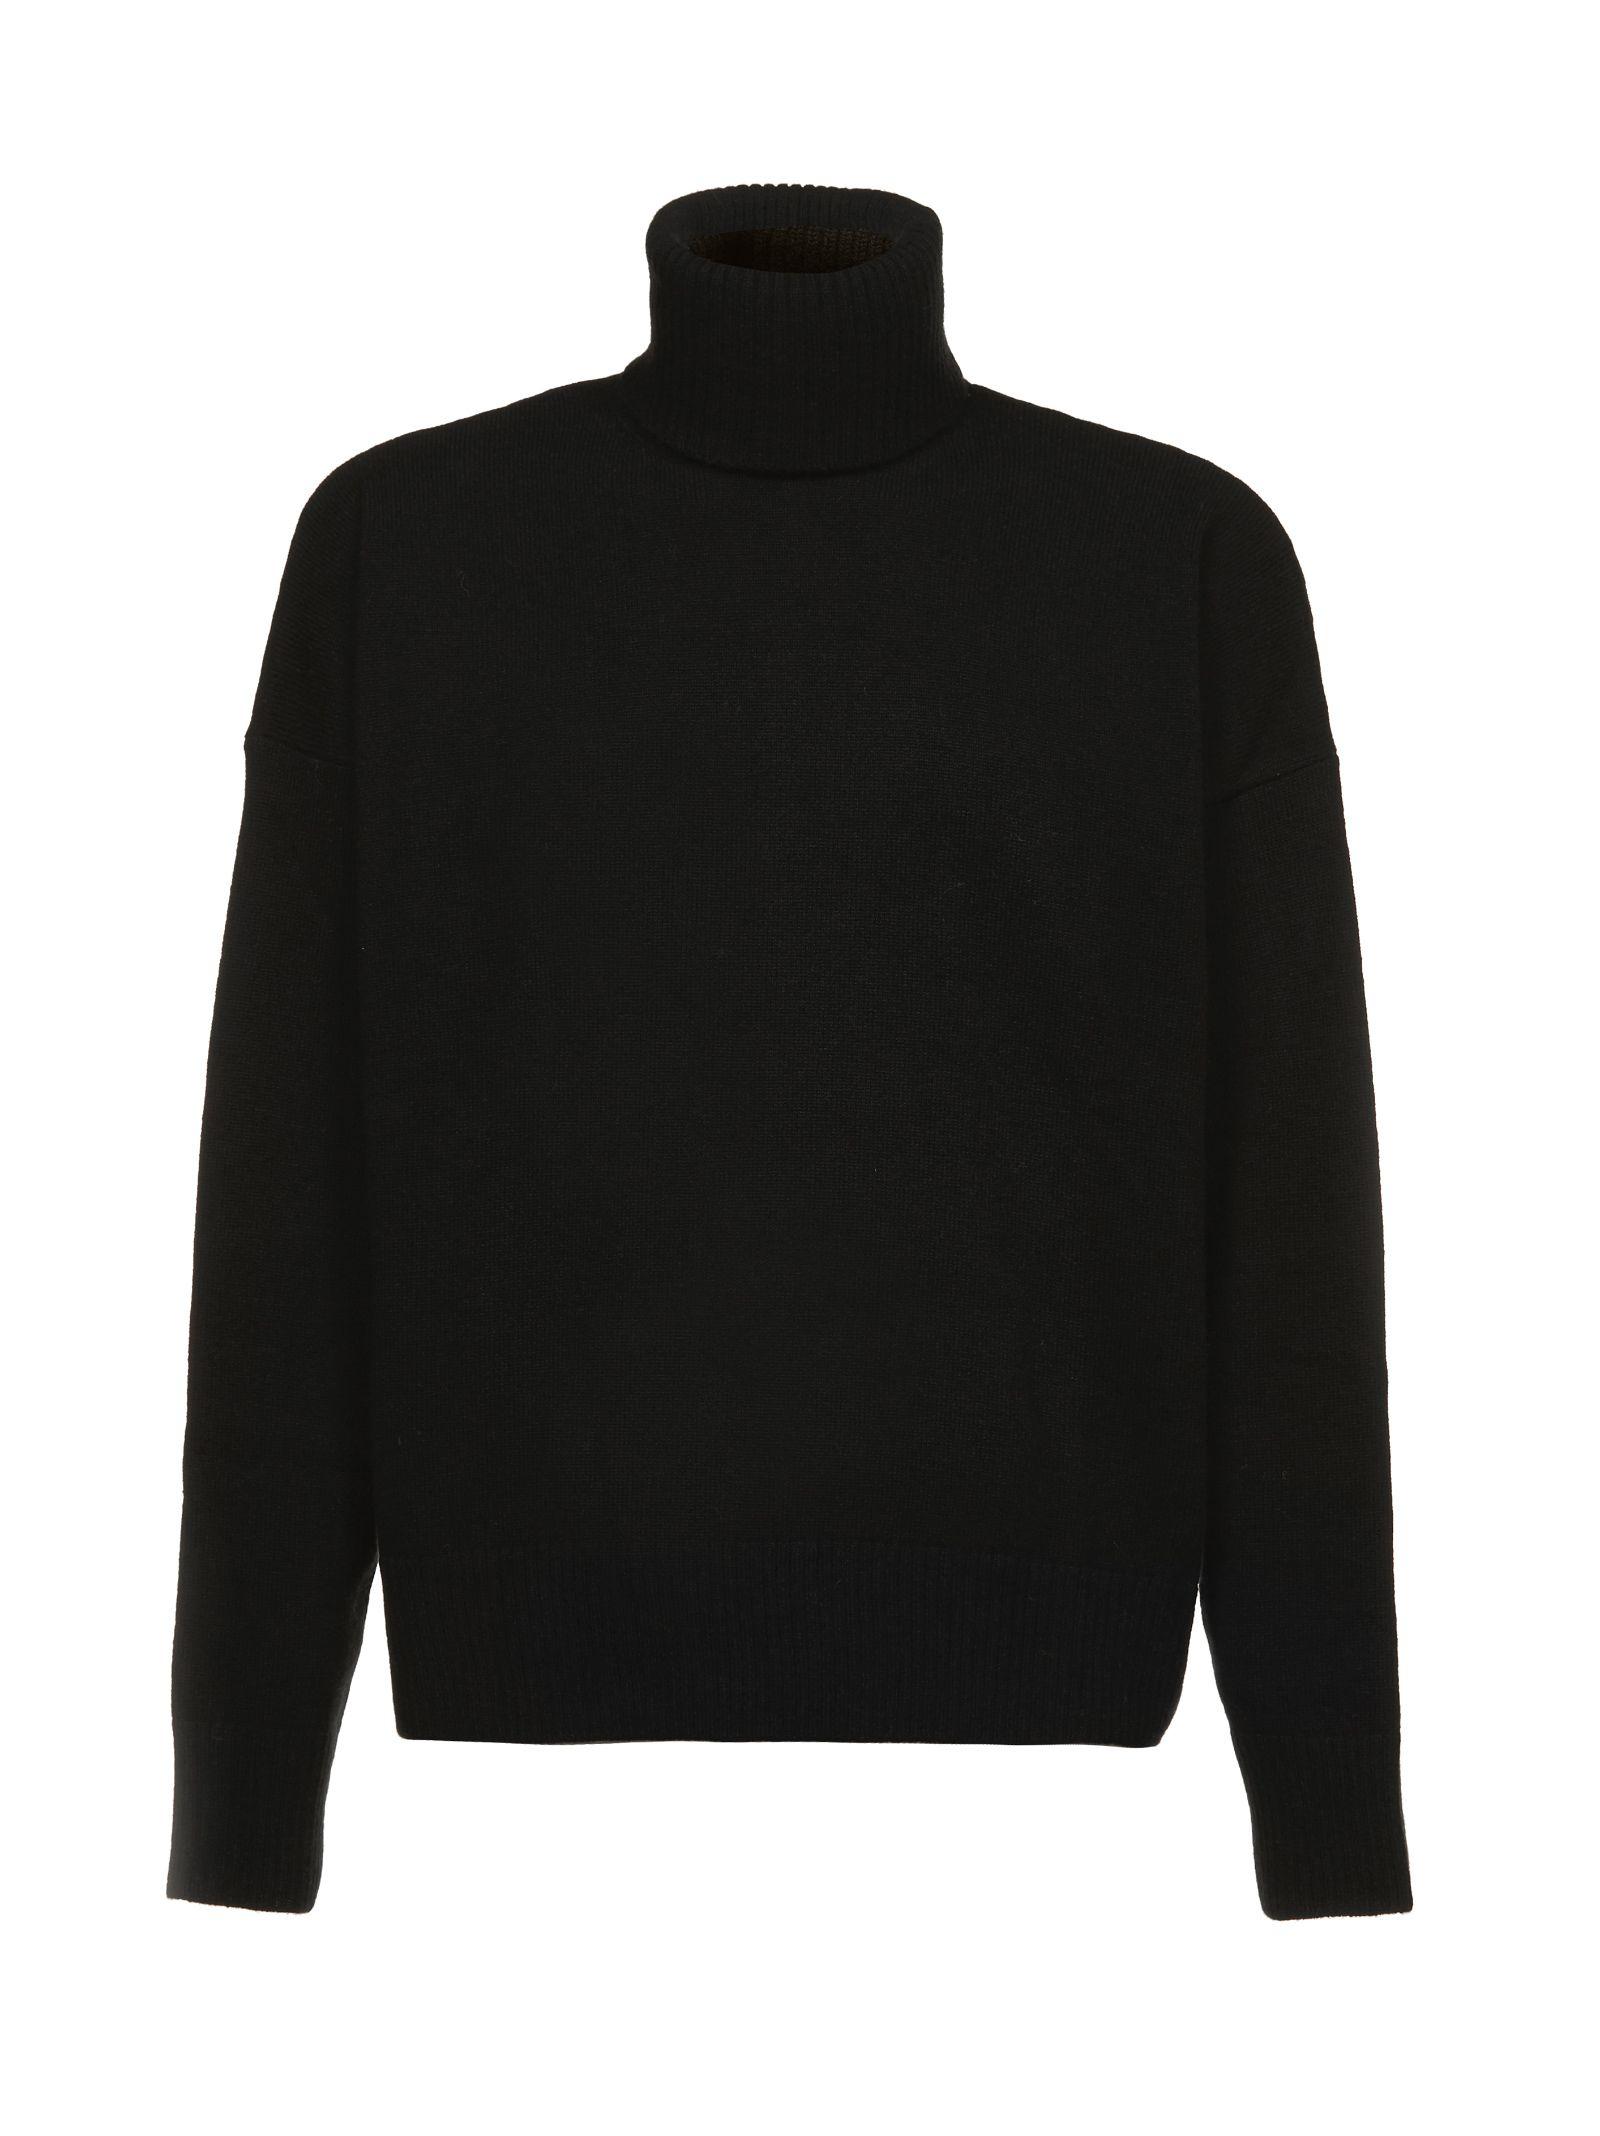 ami alexandre mattiussi -  Turtle Neck Oversized Fit Sweater